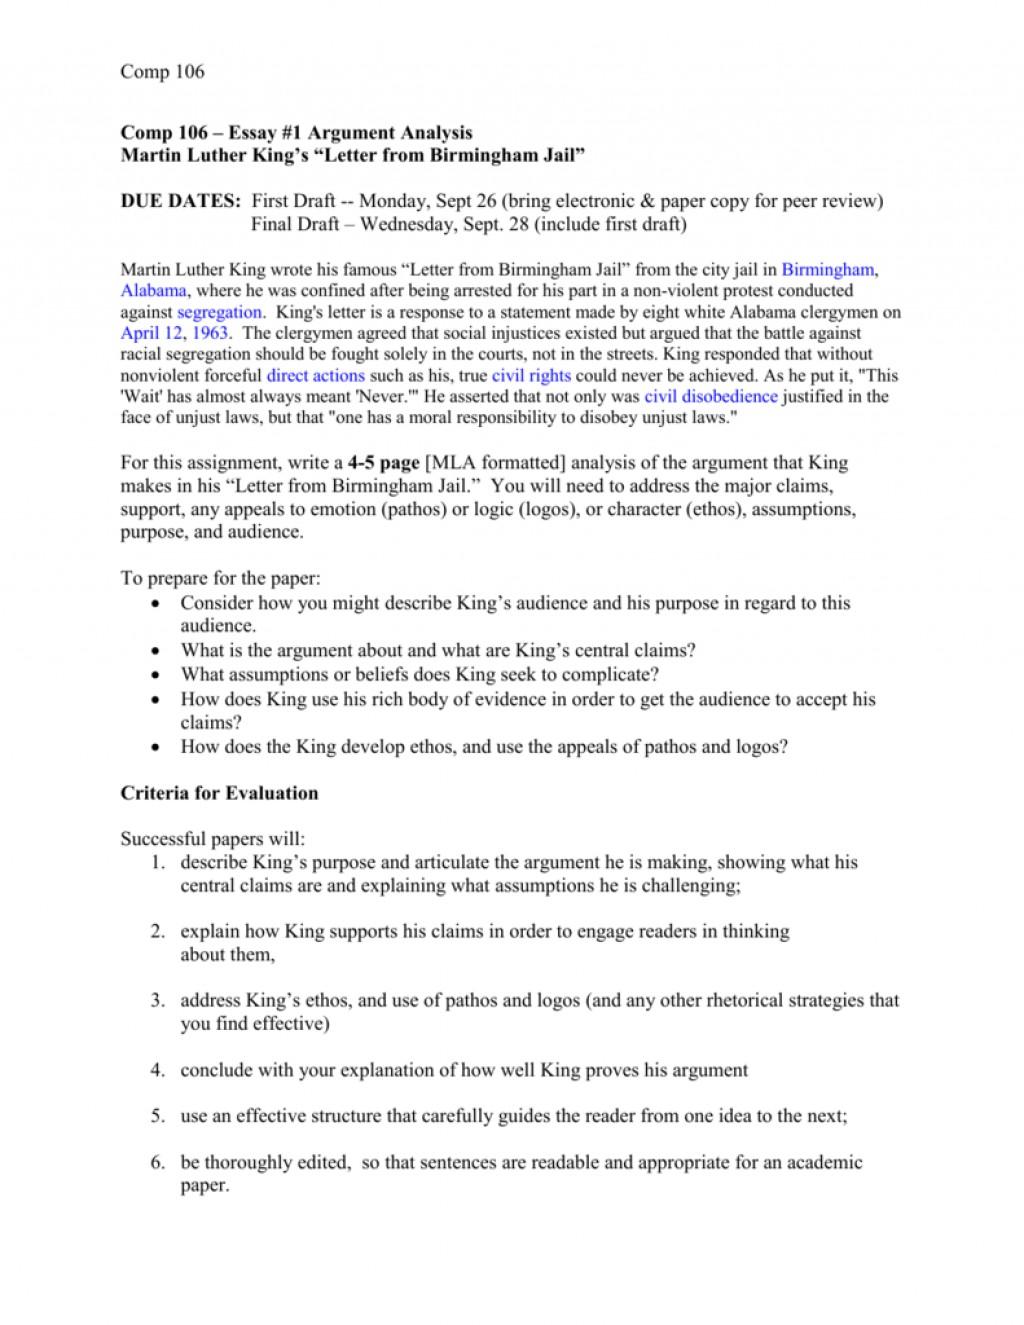 001 Letter From Birmingham Jail Ethos Pathos Logos Essay Example 008006798 1 Top Large